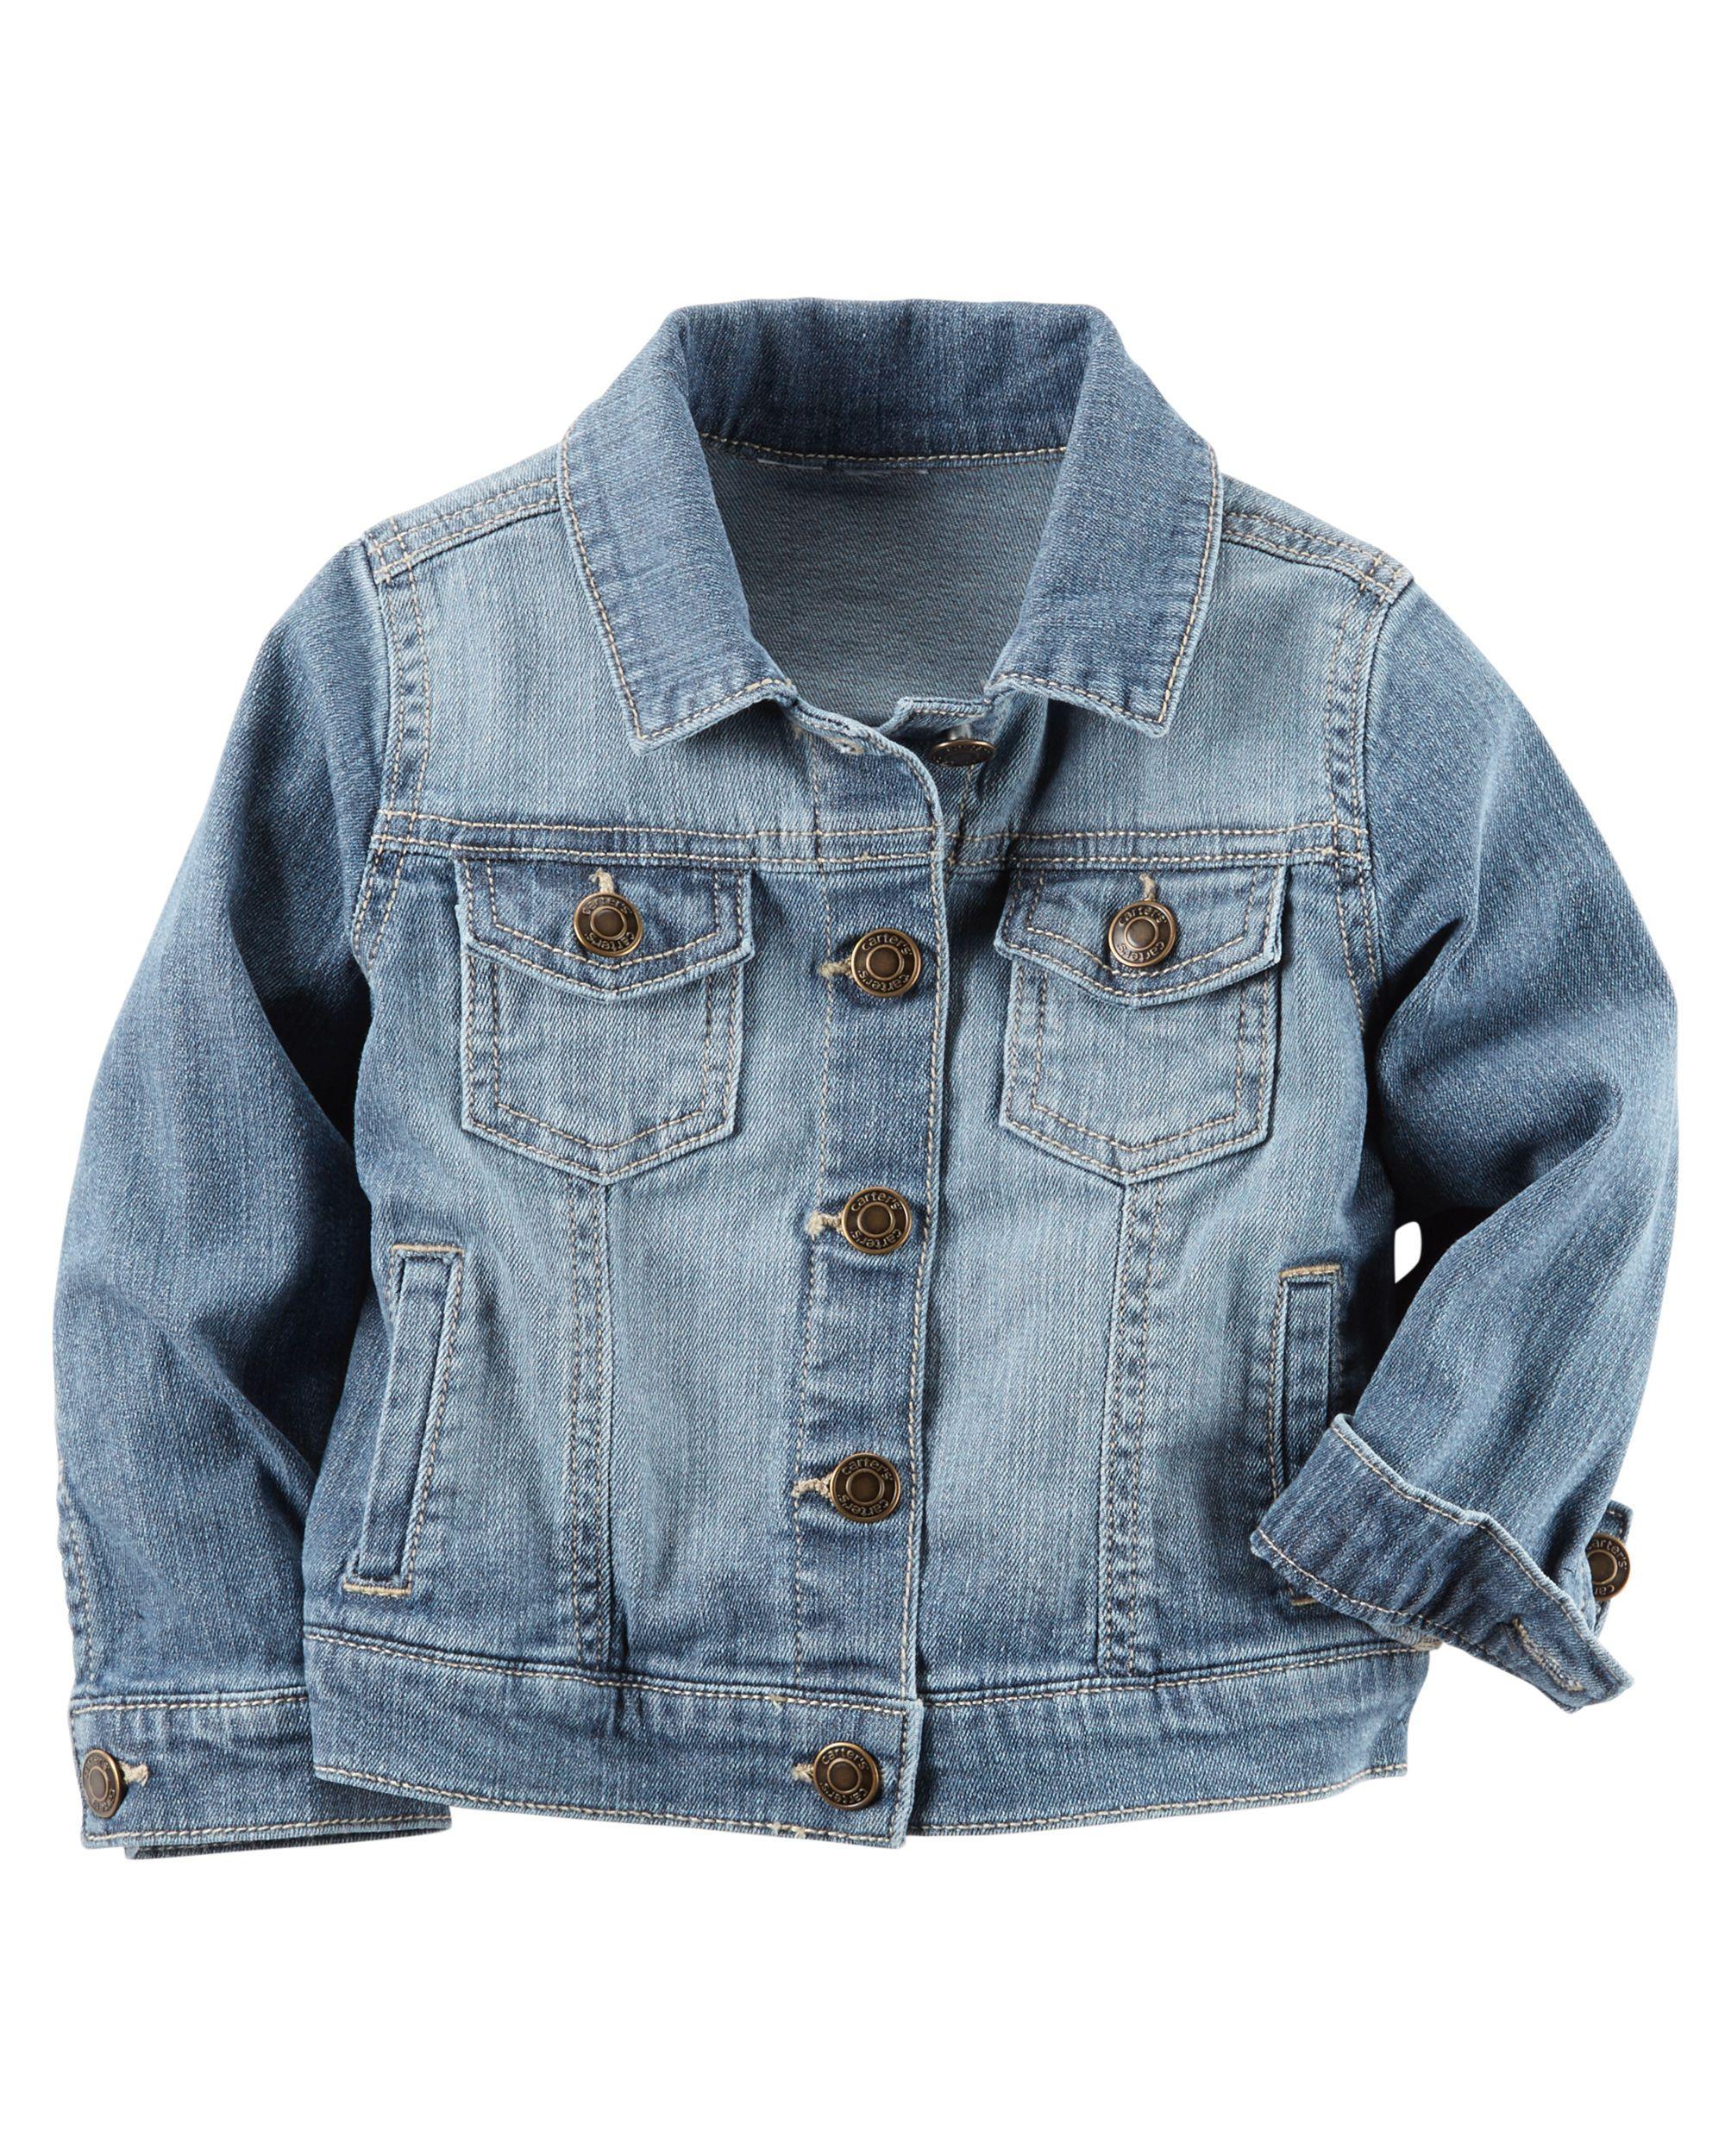 0ae1088db096 Denim Jacket